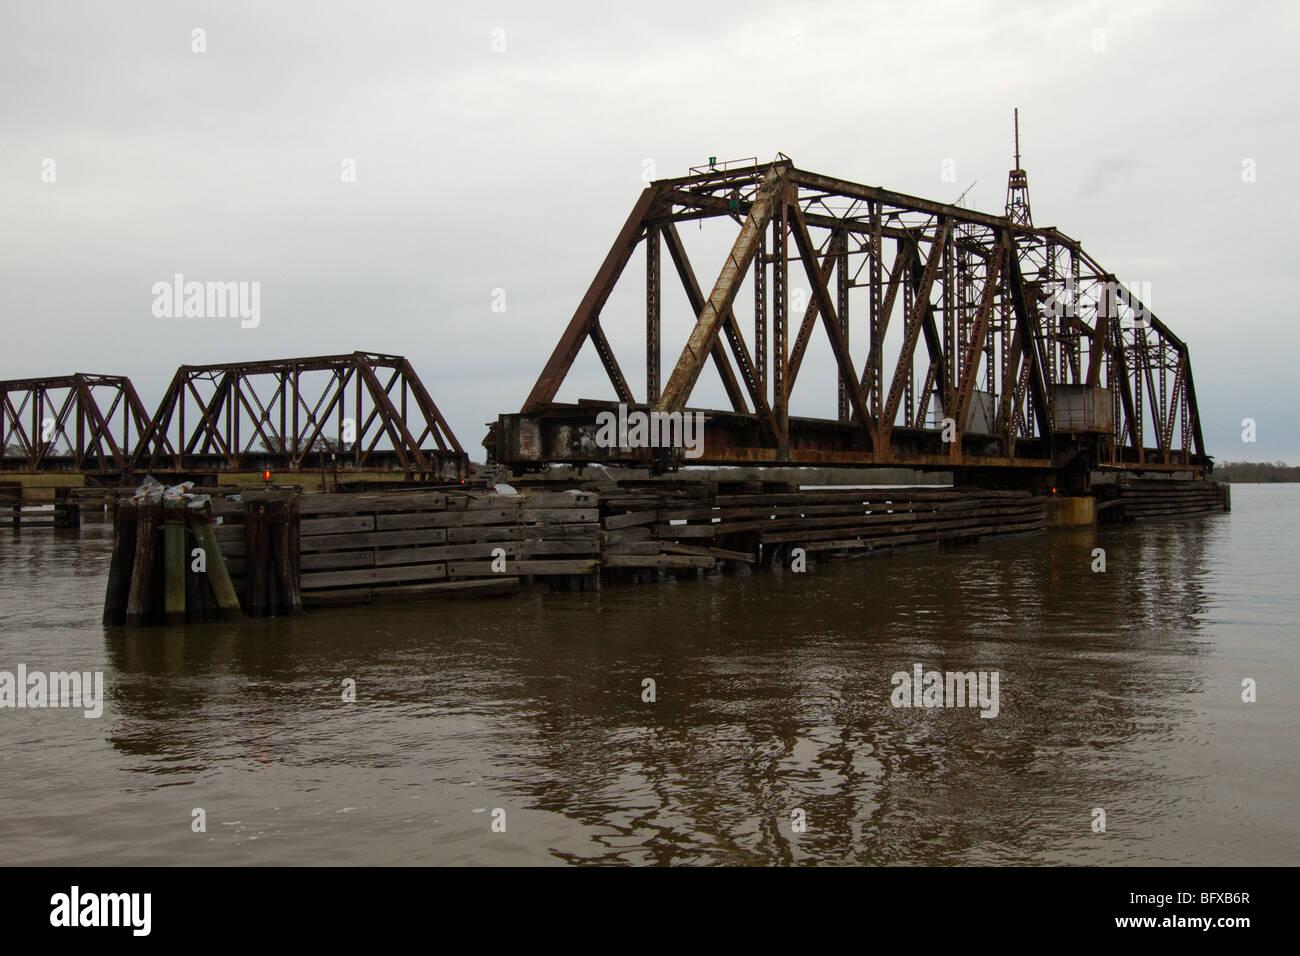 Apalachicola Railroad swing bridge - Stock Image